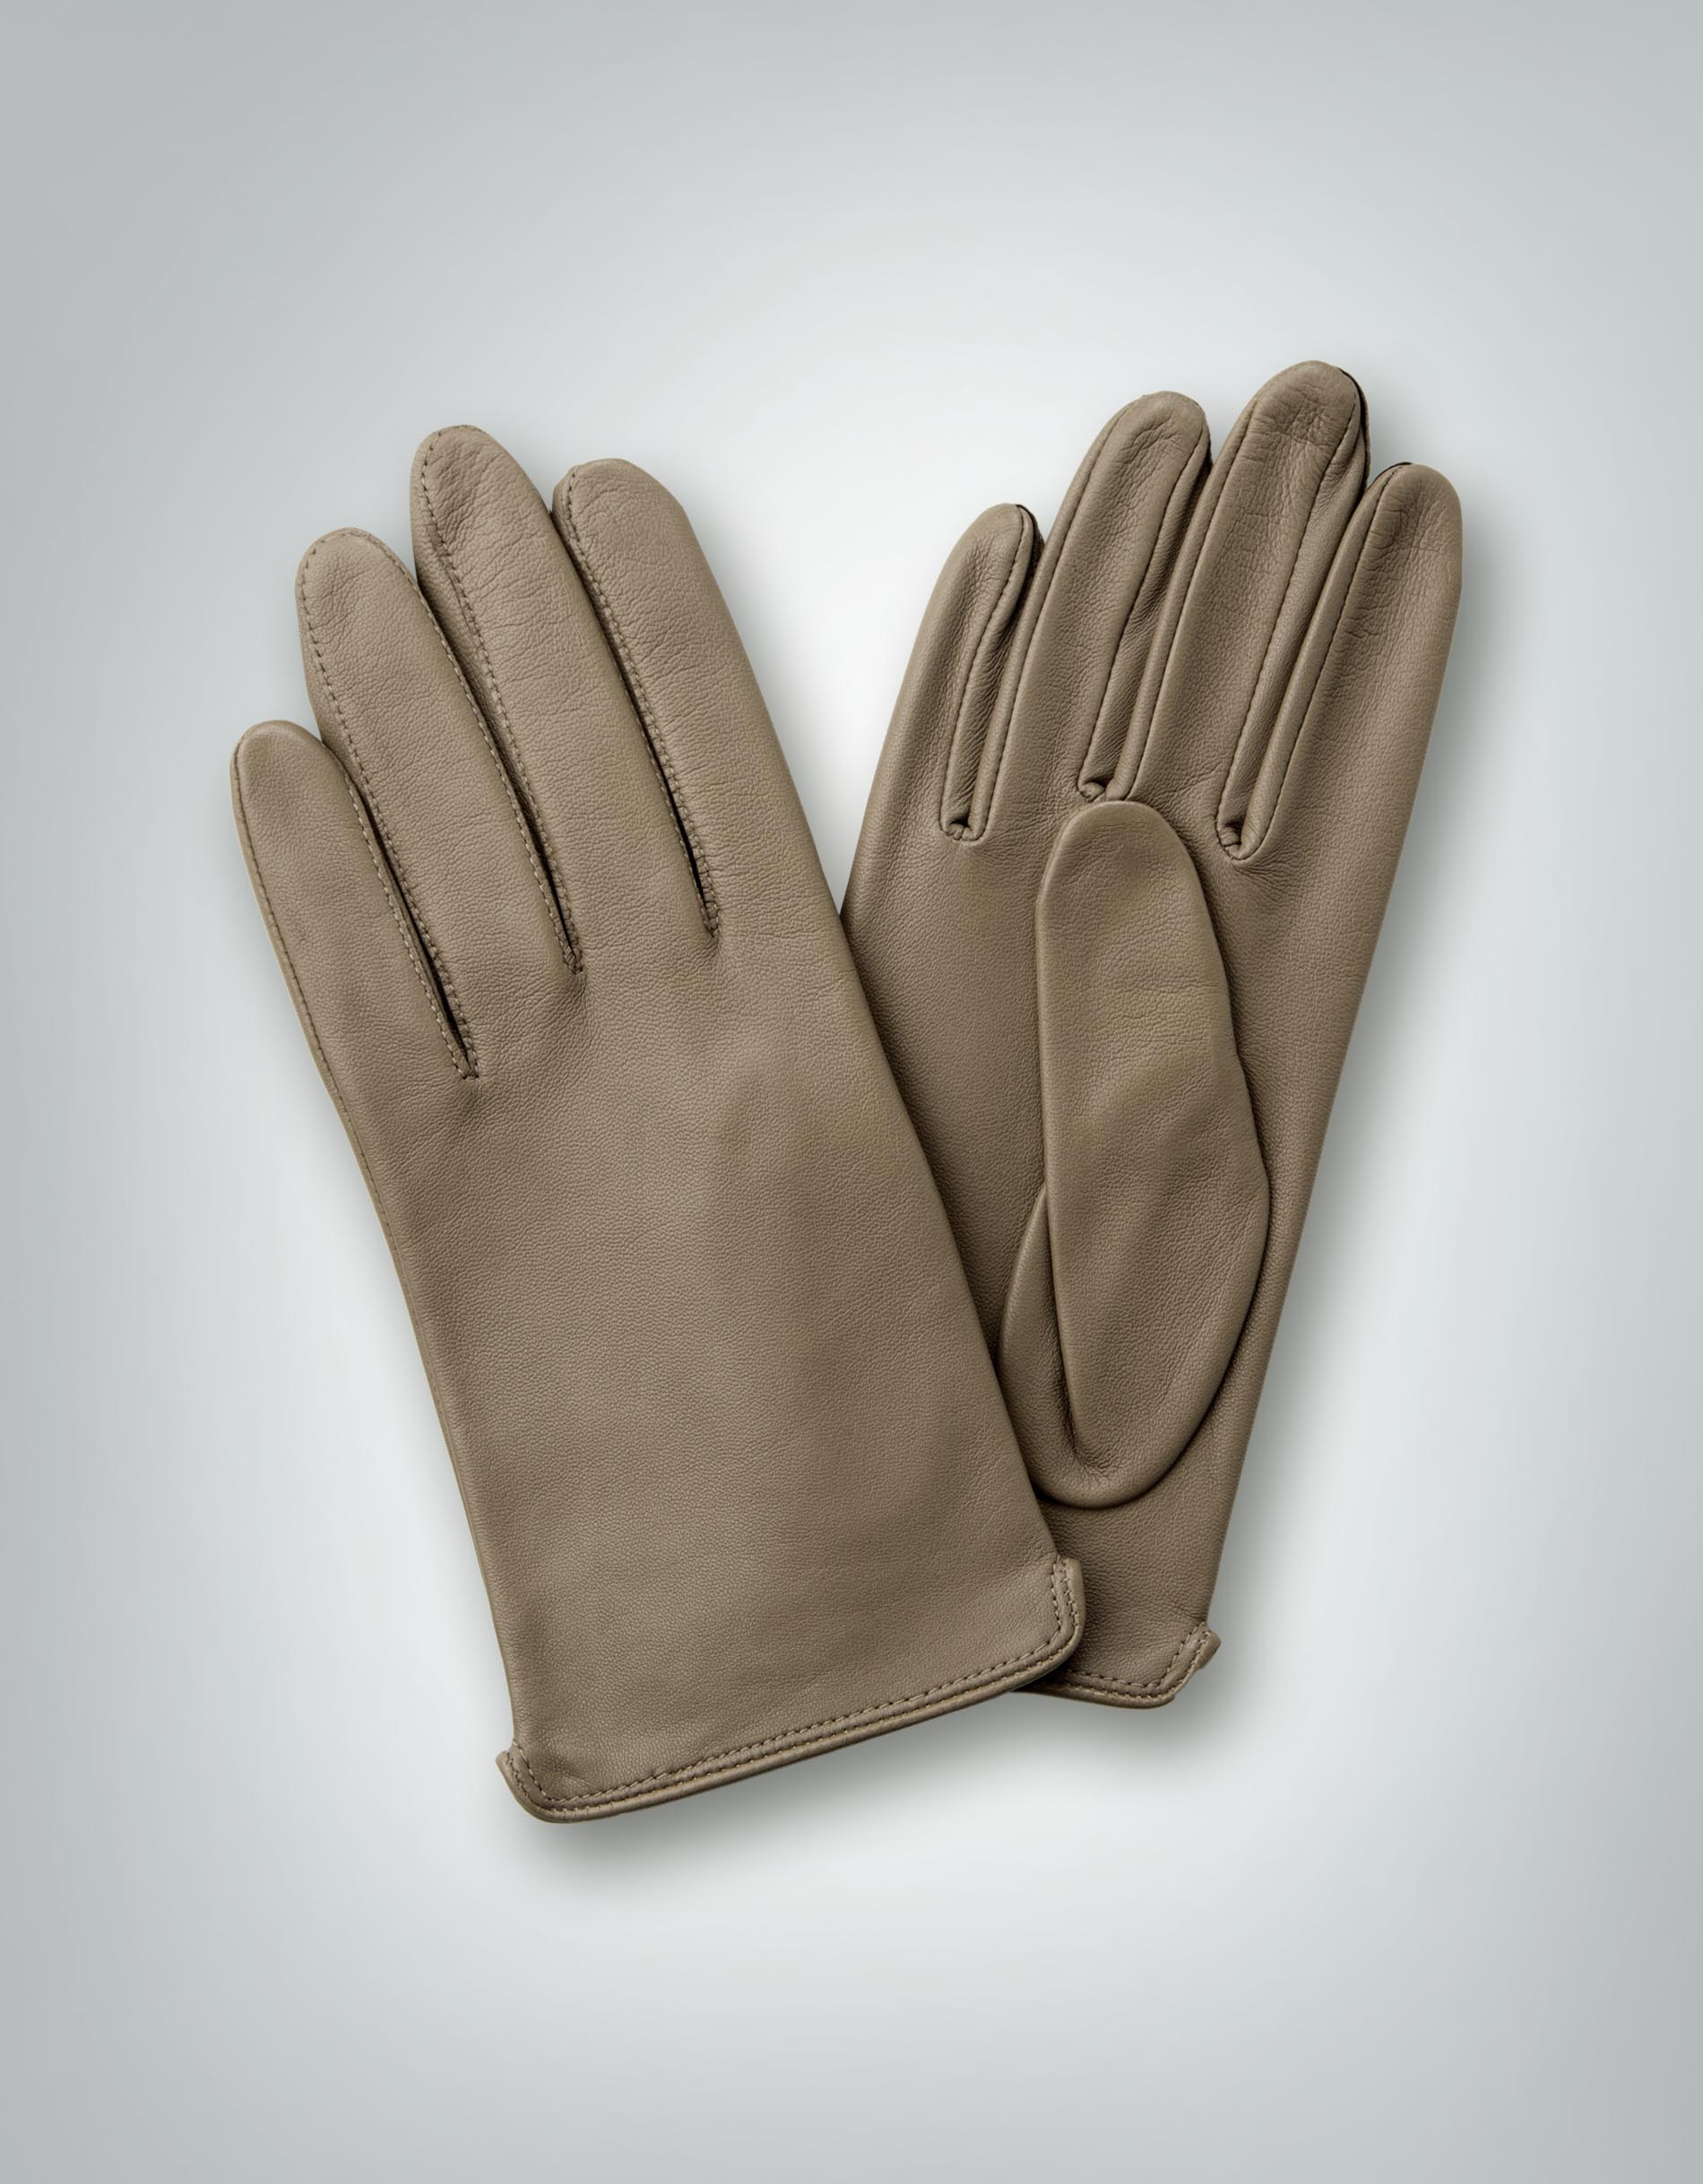 roeckl damen handschuhe aus feinstem haarschaf leder. Black Bedroom Furniture Sets. Home Design Ideas